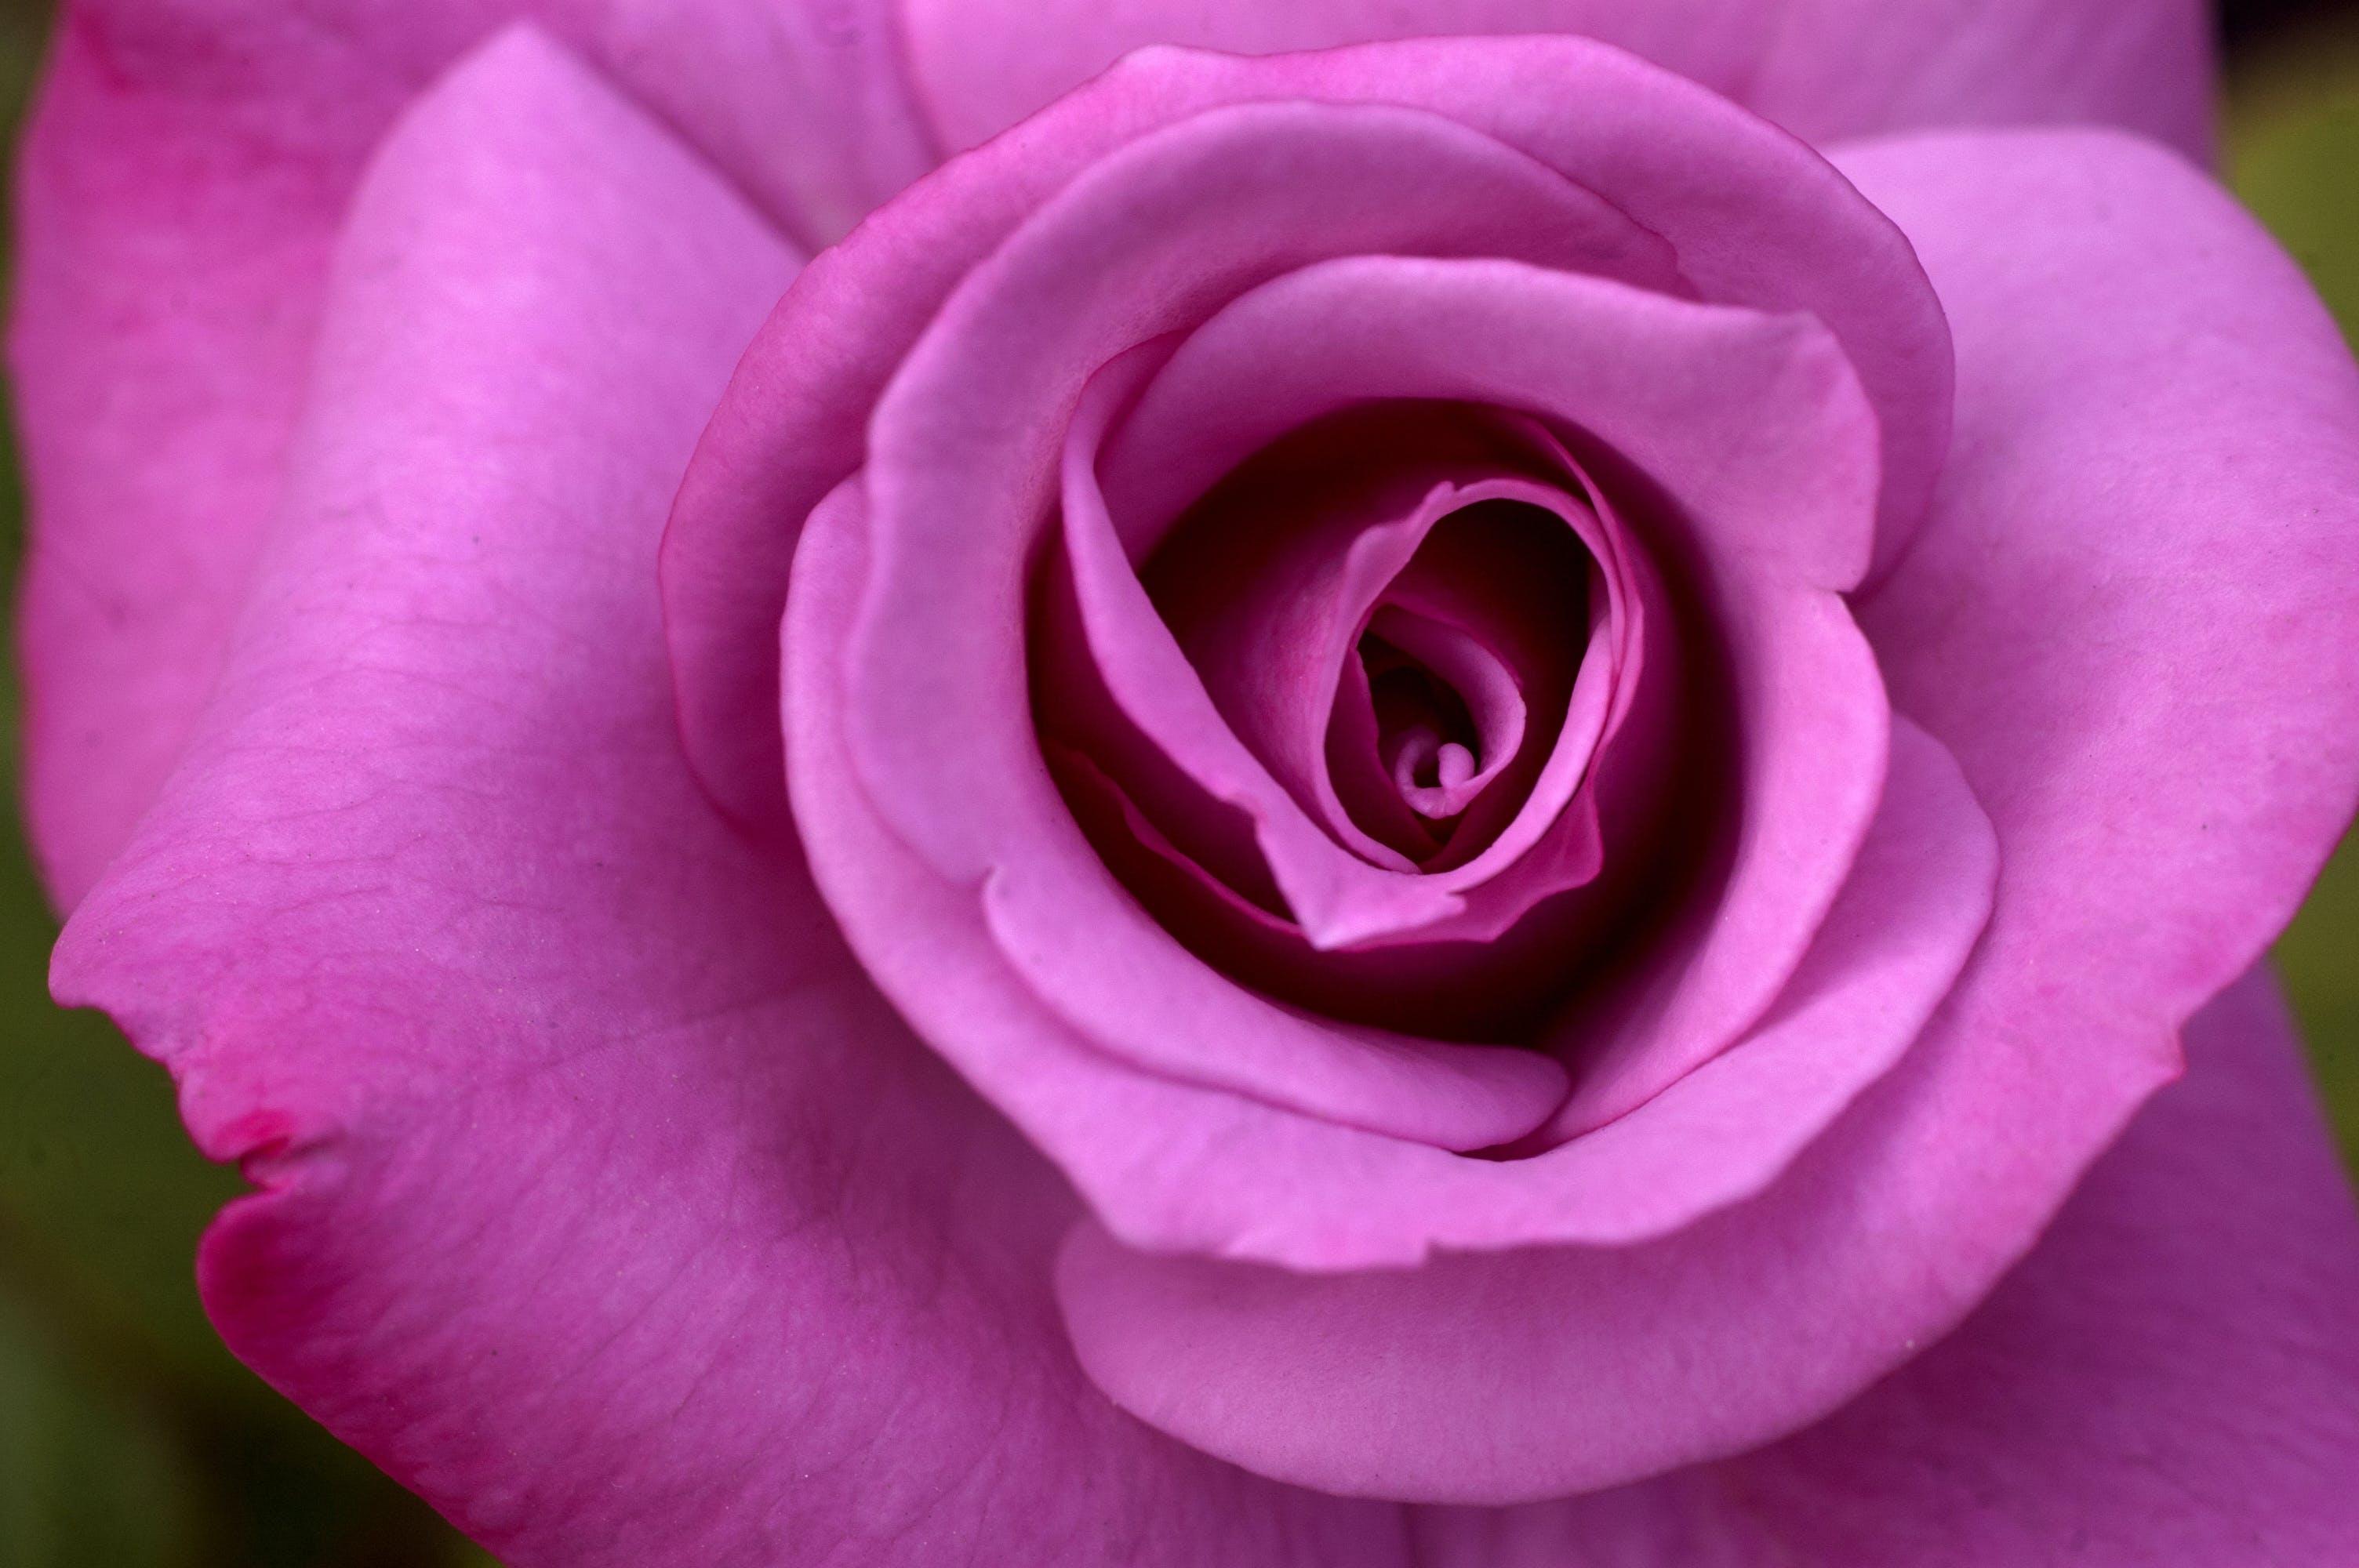 Free stock photo of Blooming Rose, petals, Pink Rose, rose